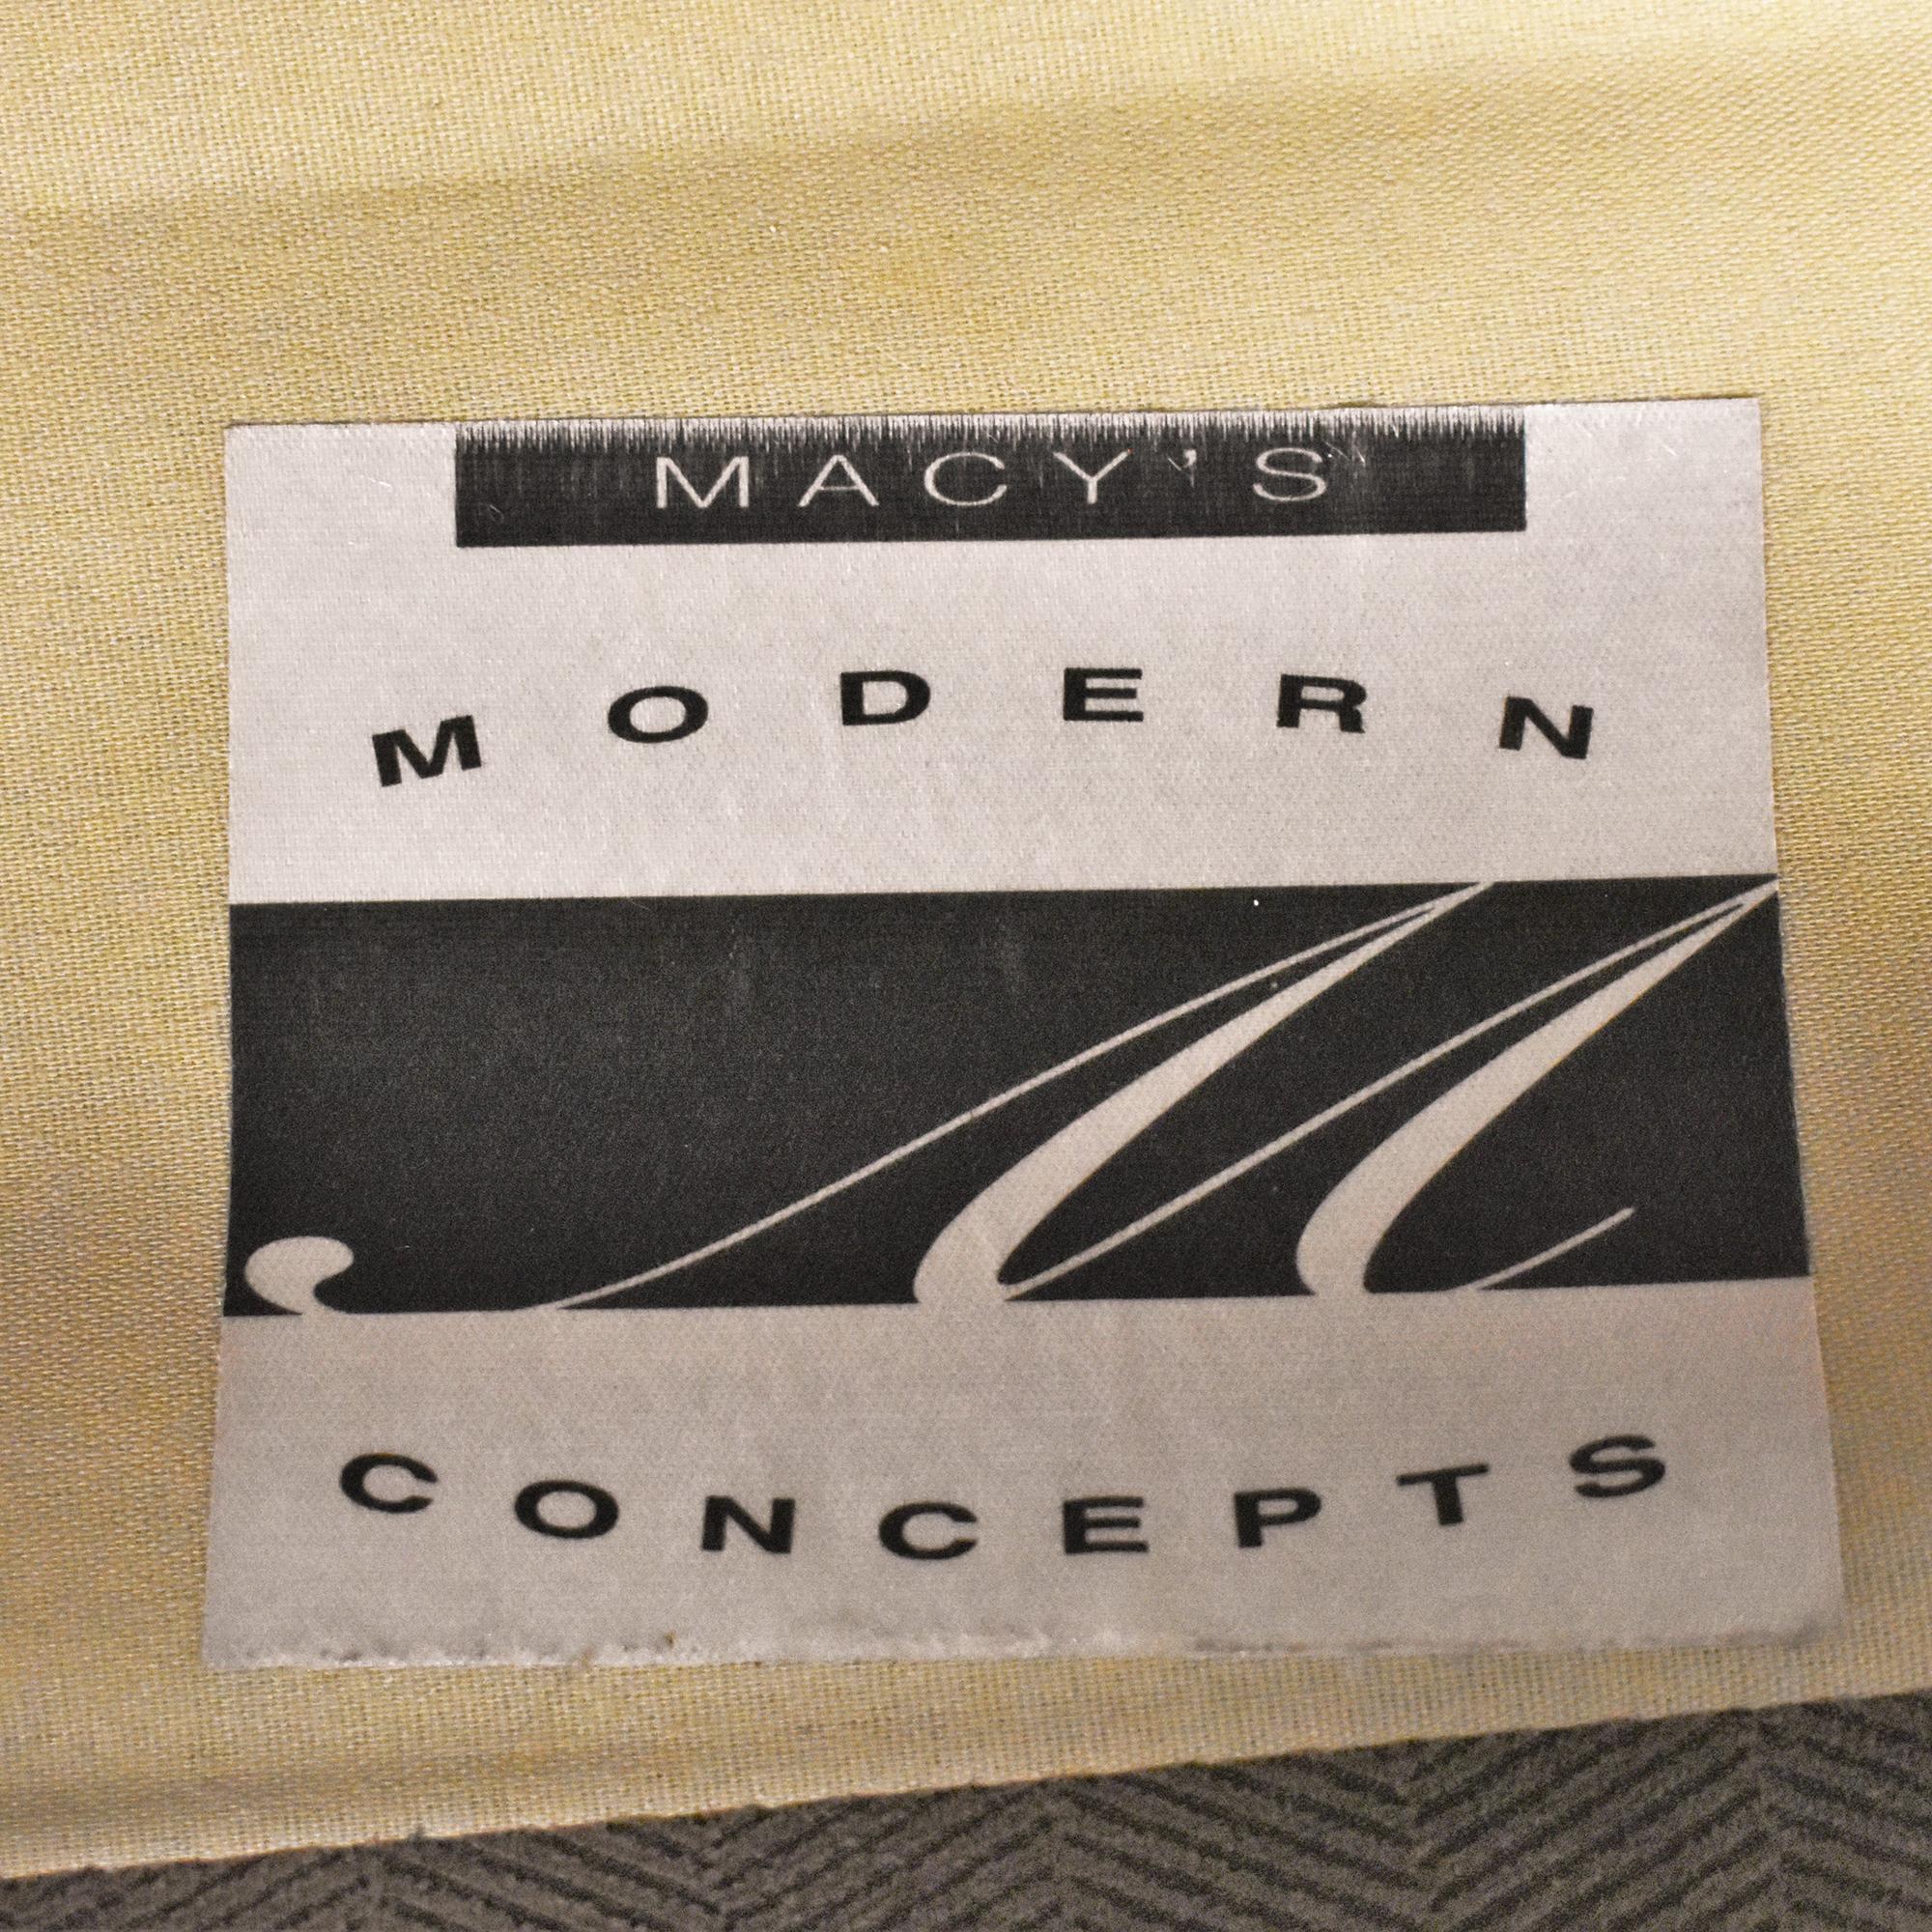 Macy's Macy's Modern Concepts Two Cushion Sofa on sale